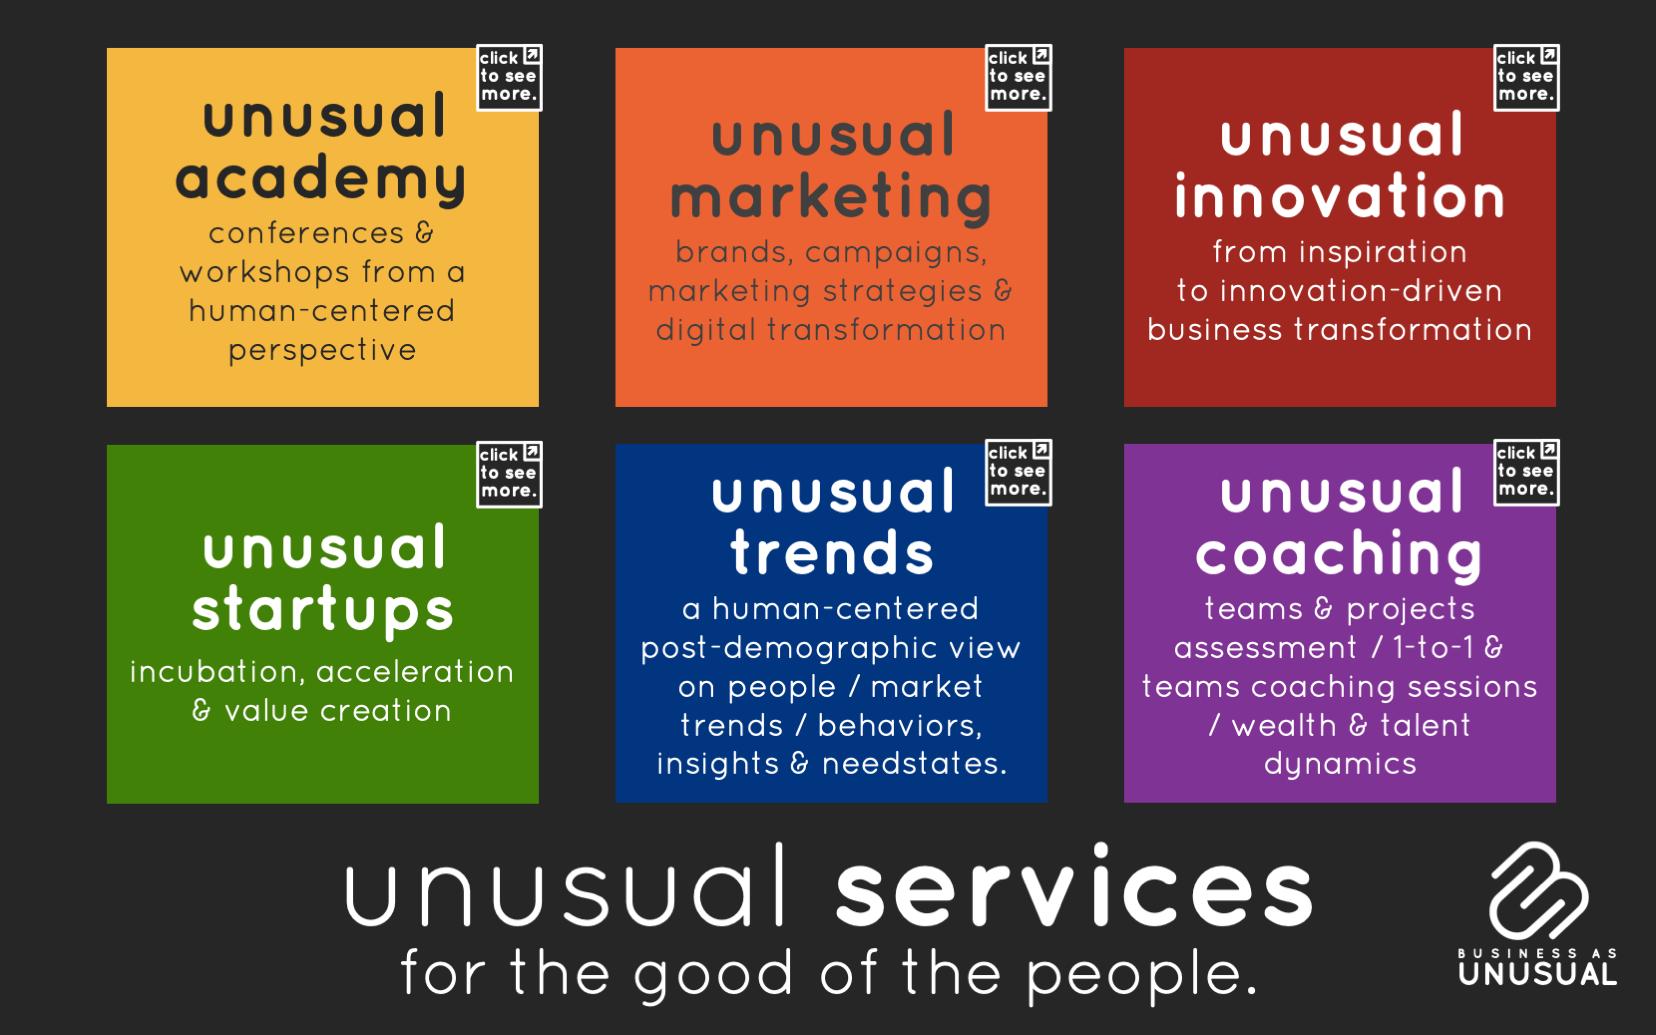 Unusual Services